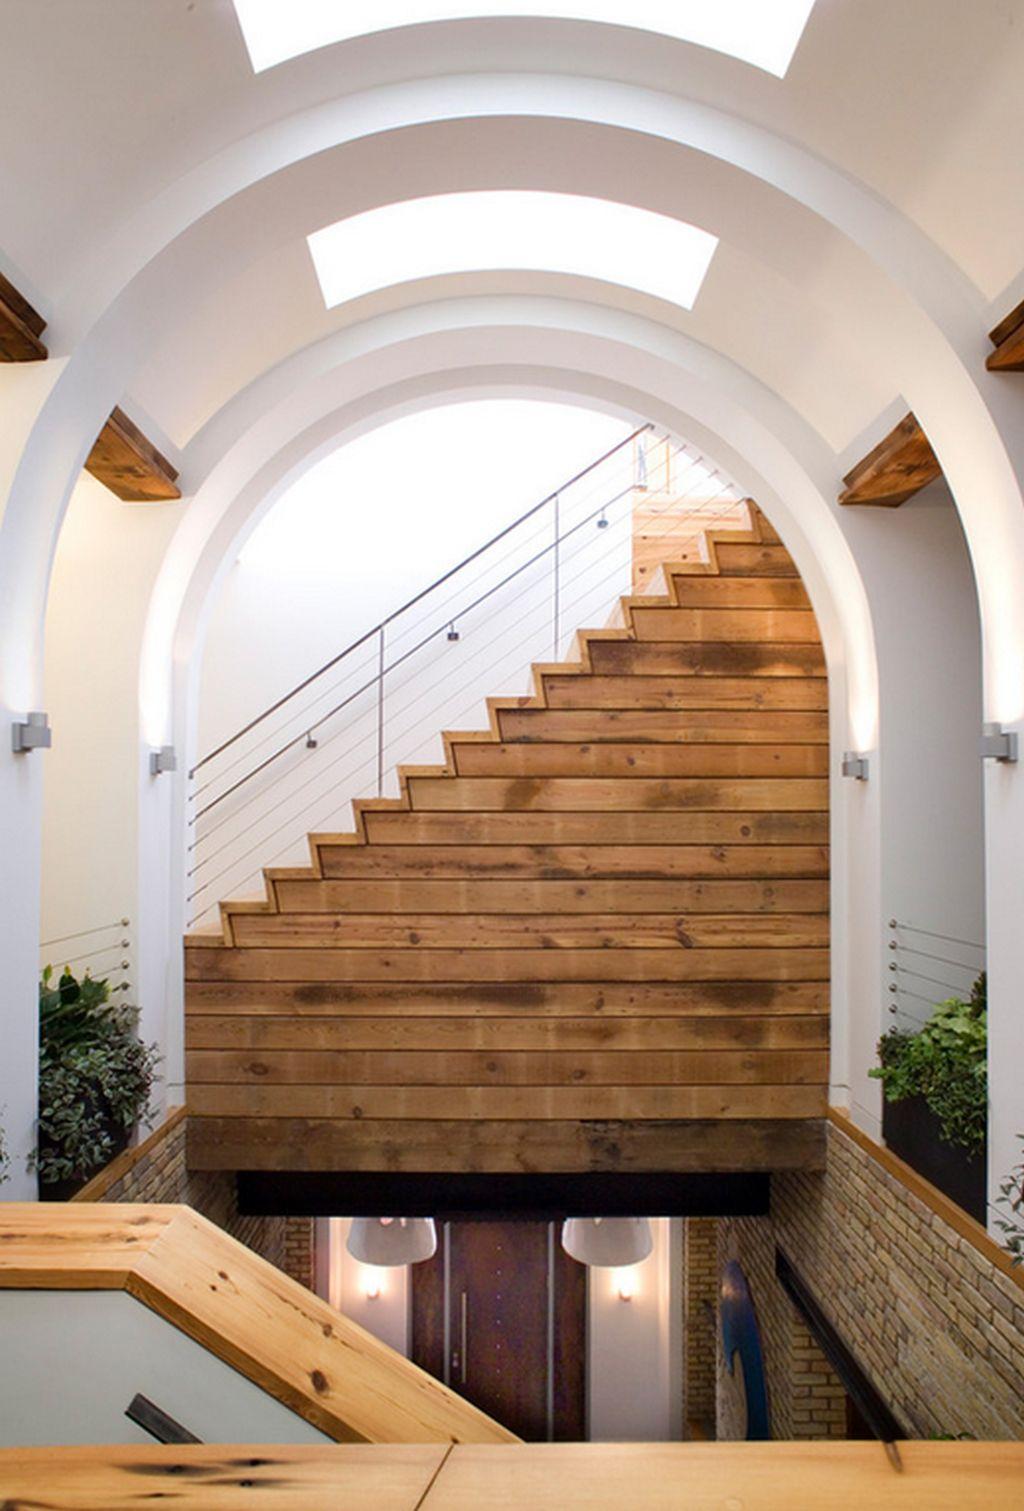 adelaparvu.com despre scoala transformata in casa Design SGW Architects (11)